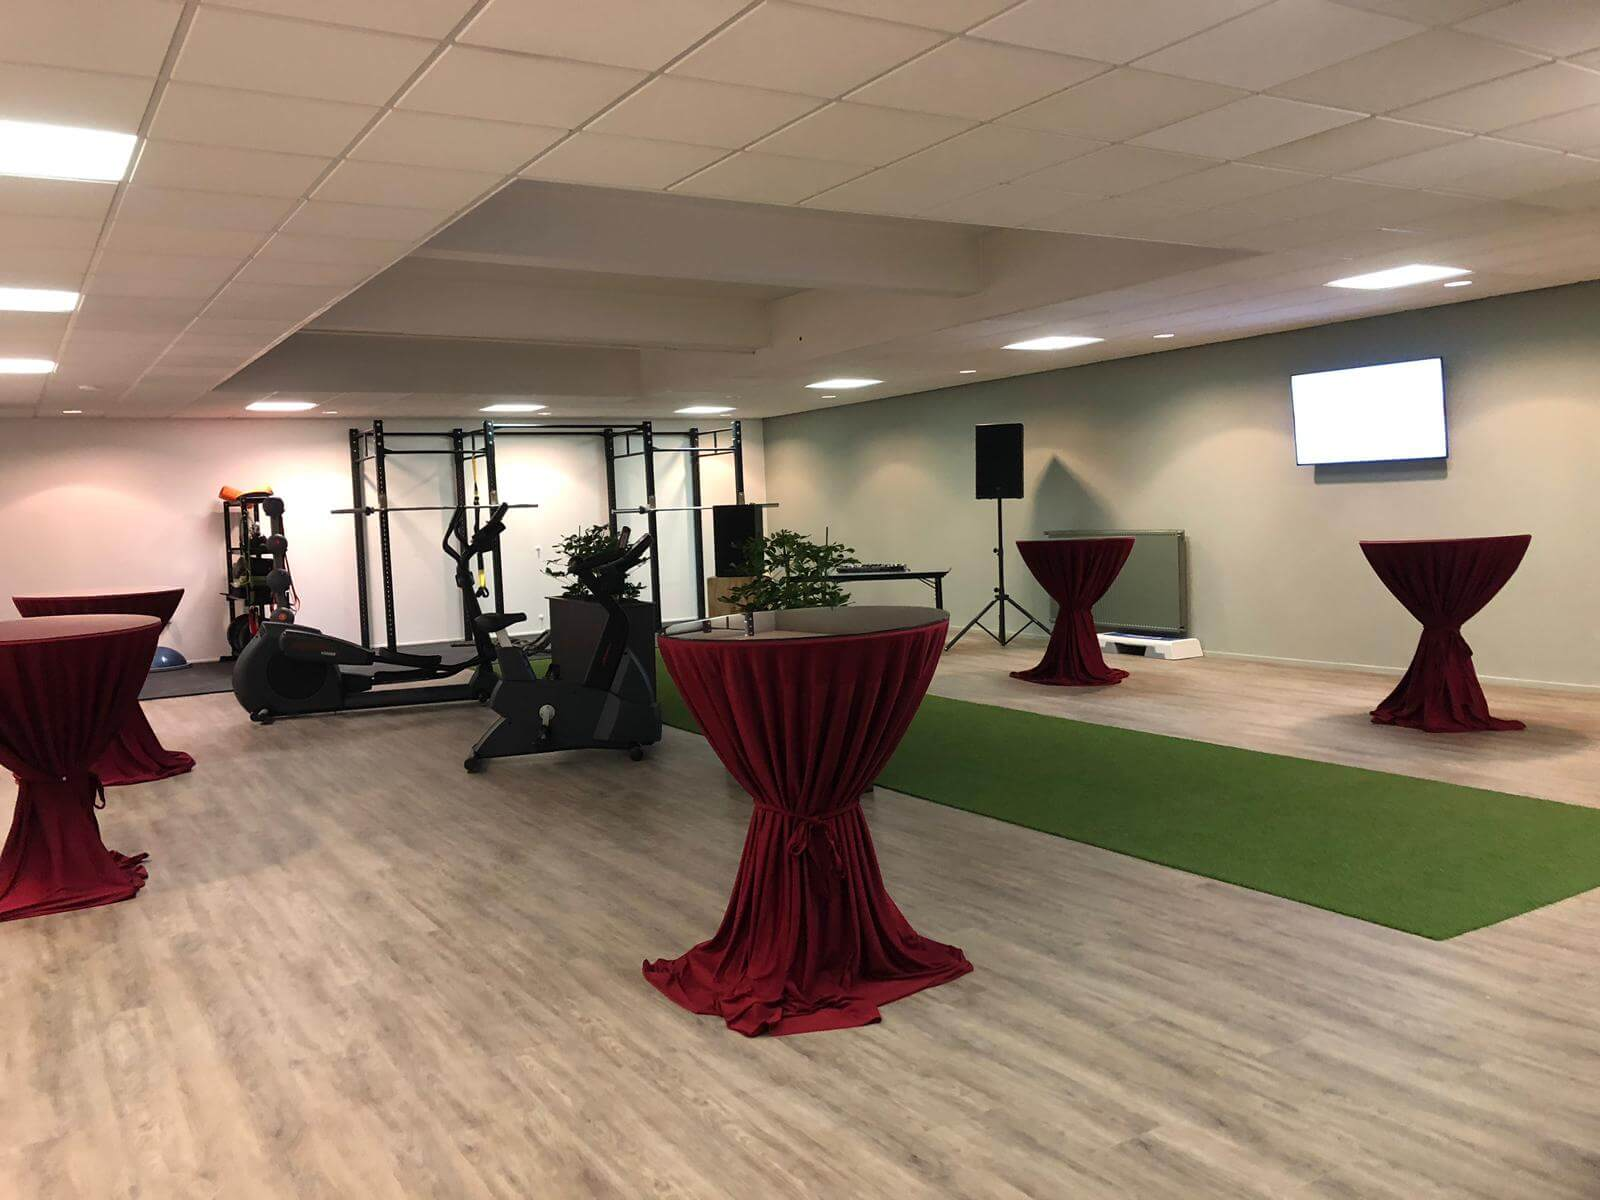 Personal Fit Club - De eerste club voor personal training in Zoetermeer is open (3)